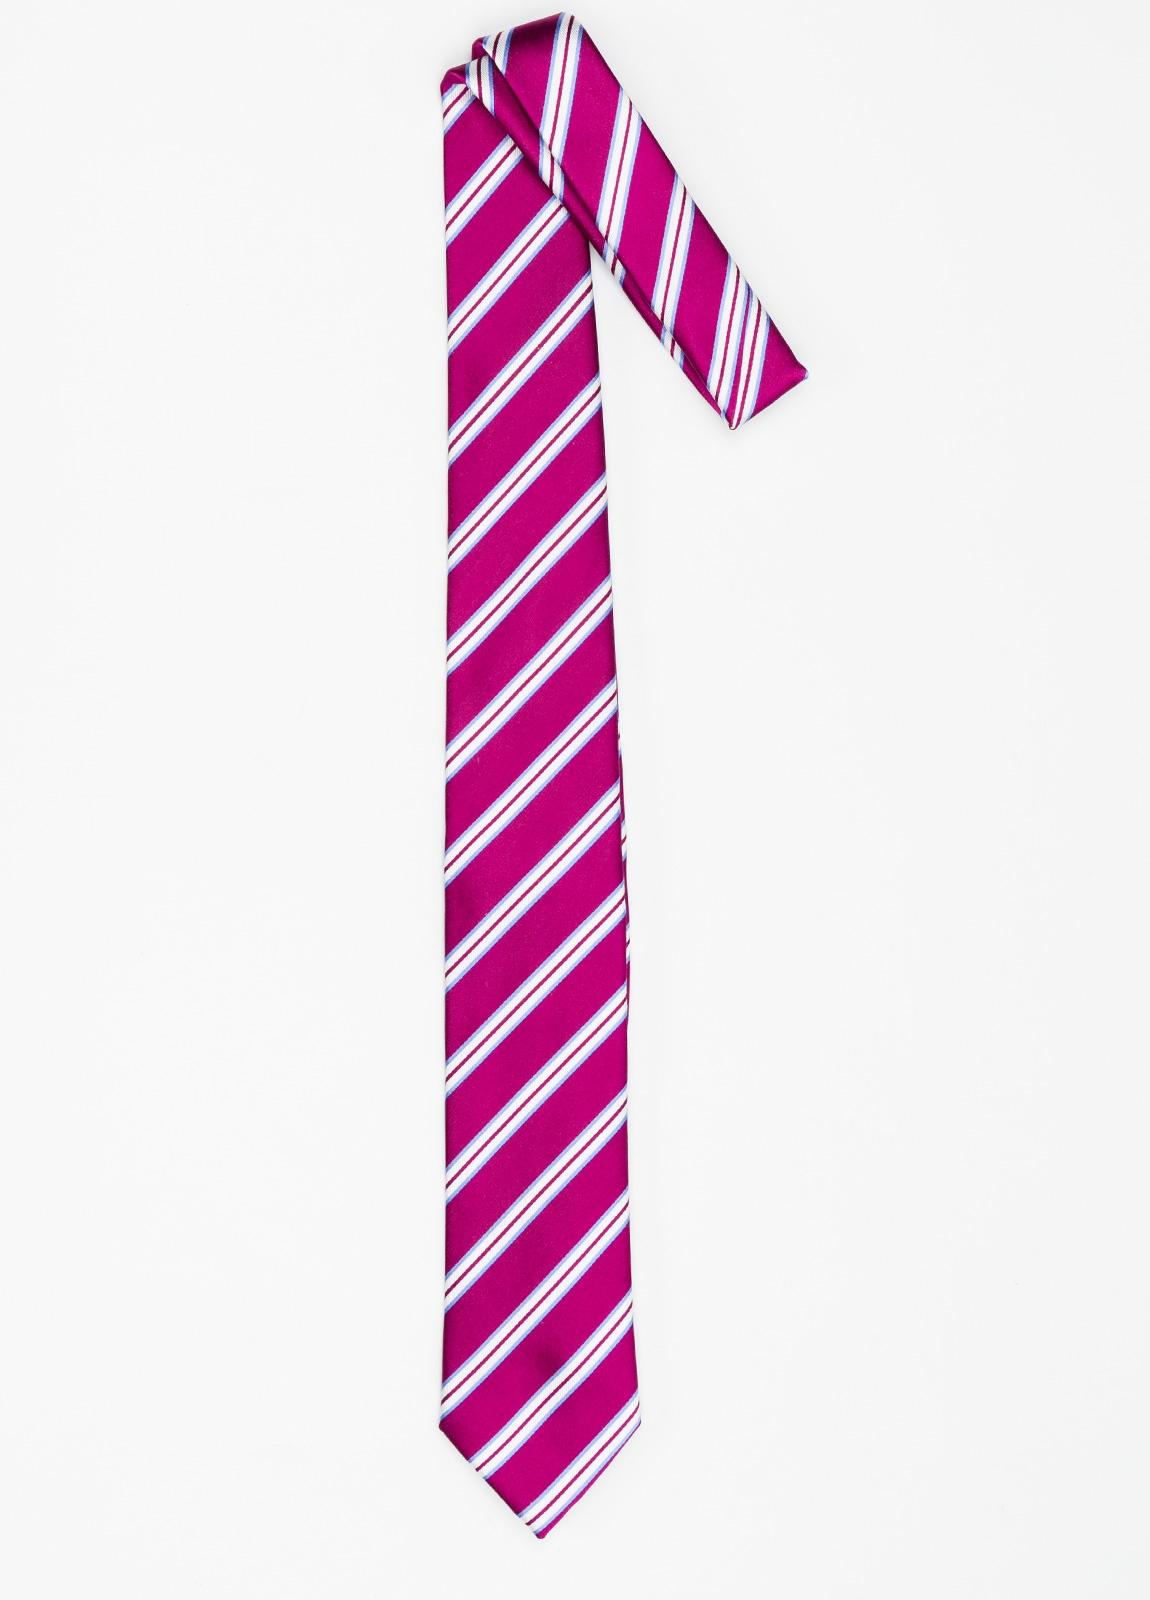 Corbata Formal Wear rayas en diagonal color fuxia. Pala 7,5 cm. 100% Seda. - Ítem1